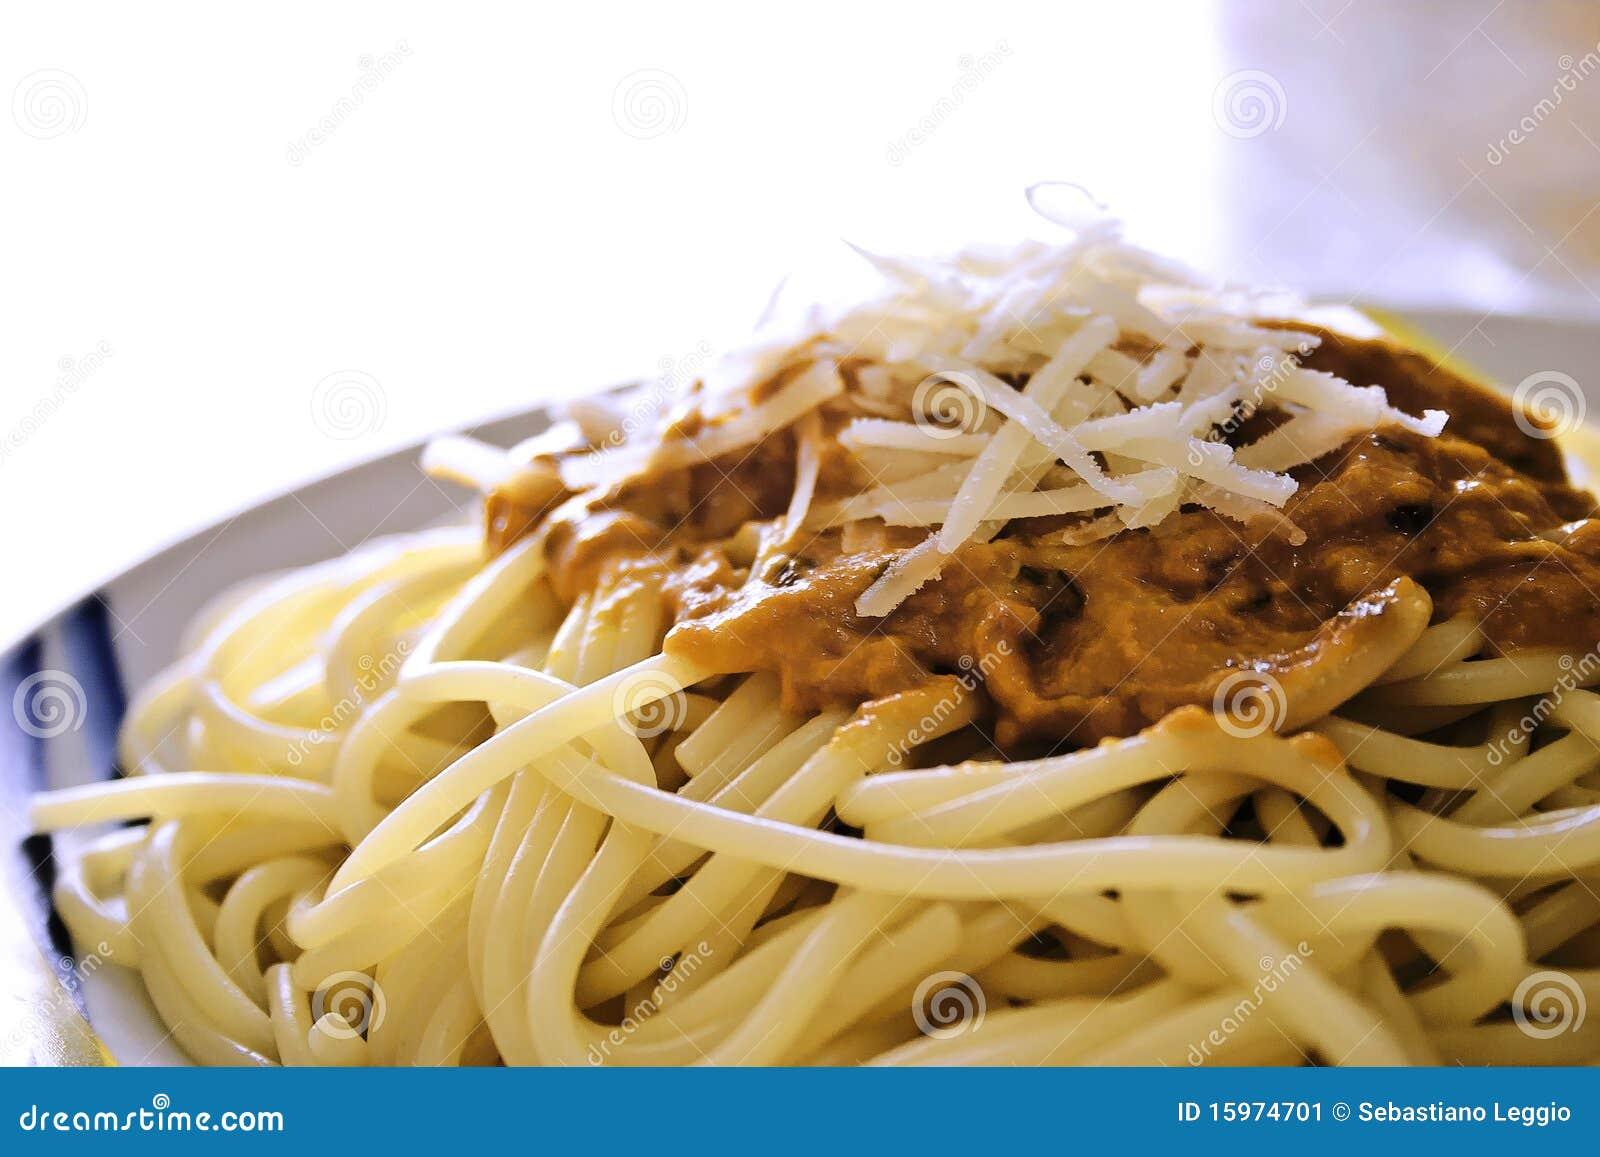 Spaghetti With Tomato Sauce Stock Image - Image: 15974701